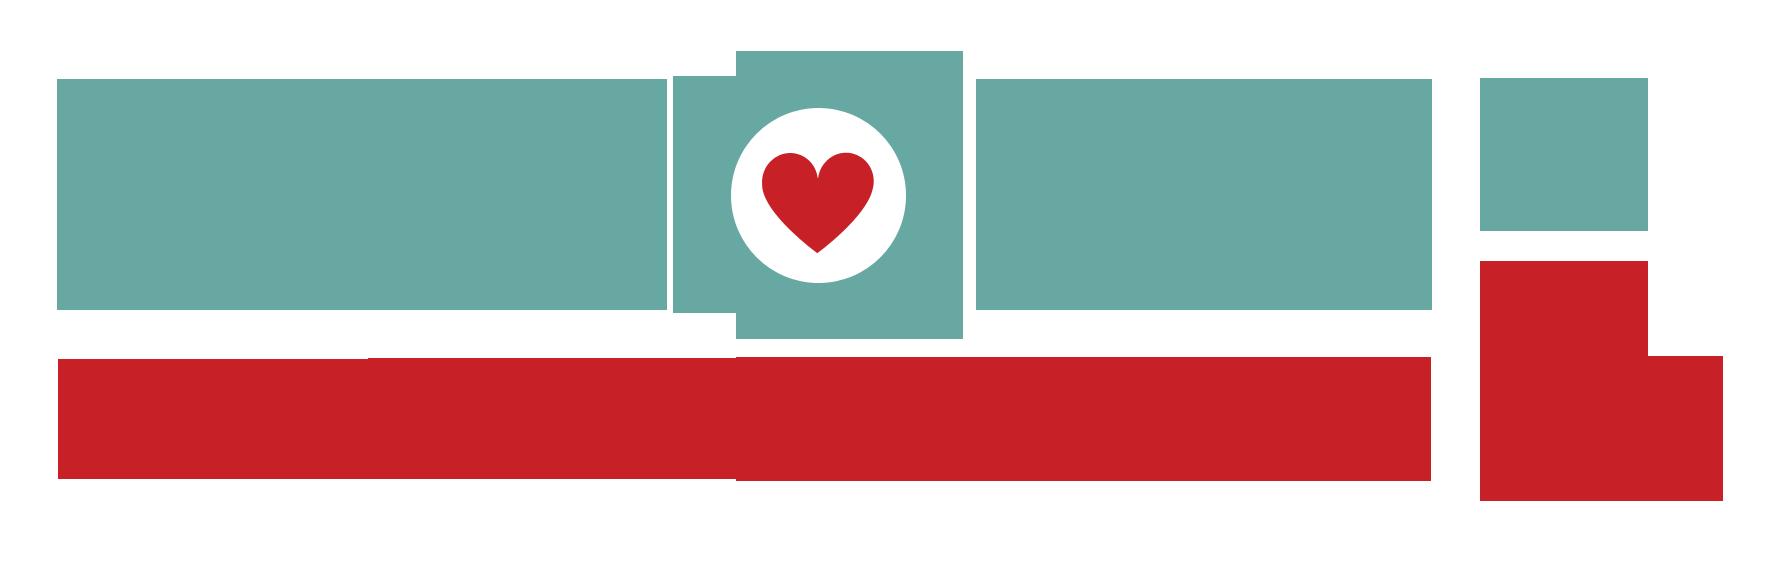 Reform the Platform